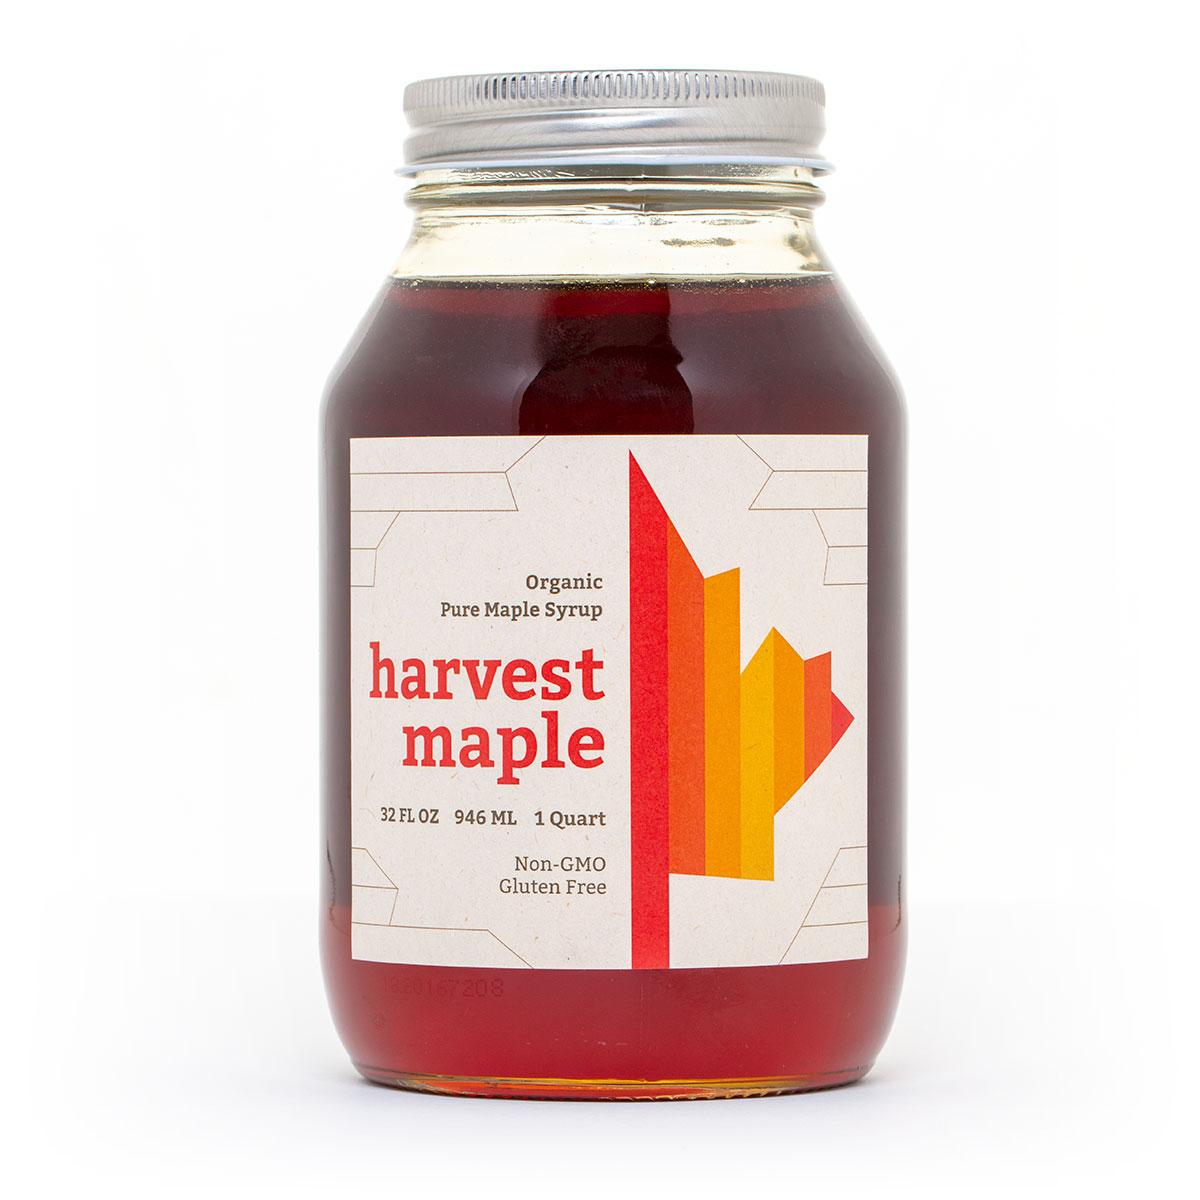 Harvest Maple Organic Maple Syrup - Quart